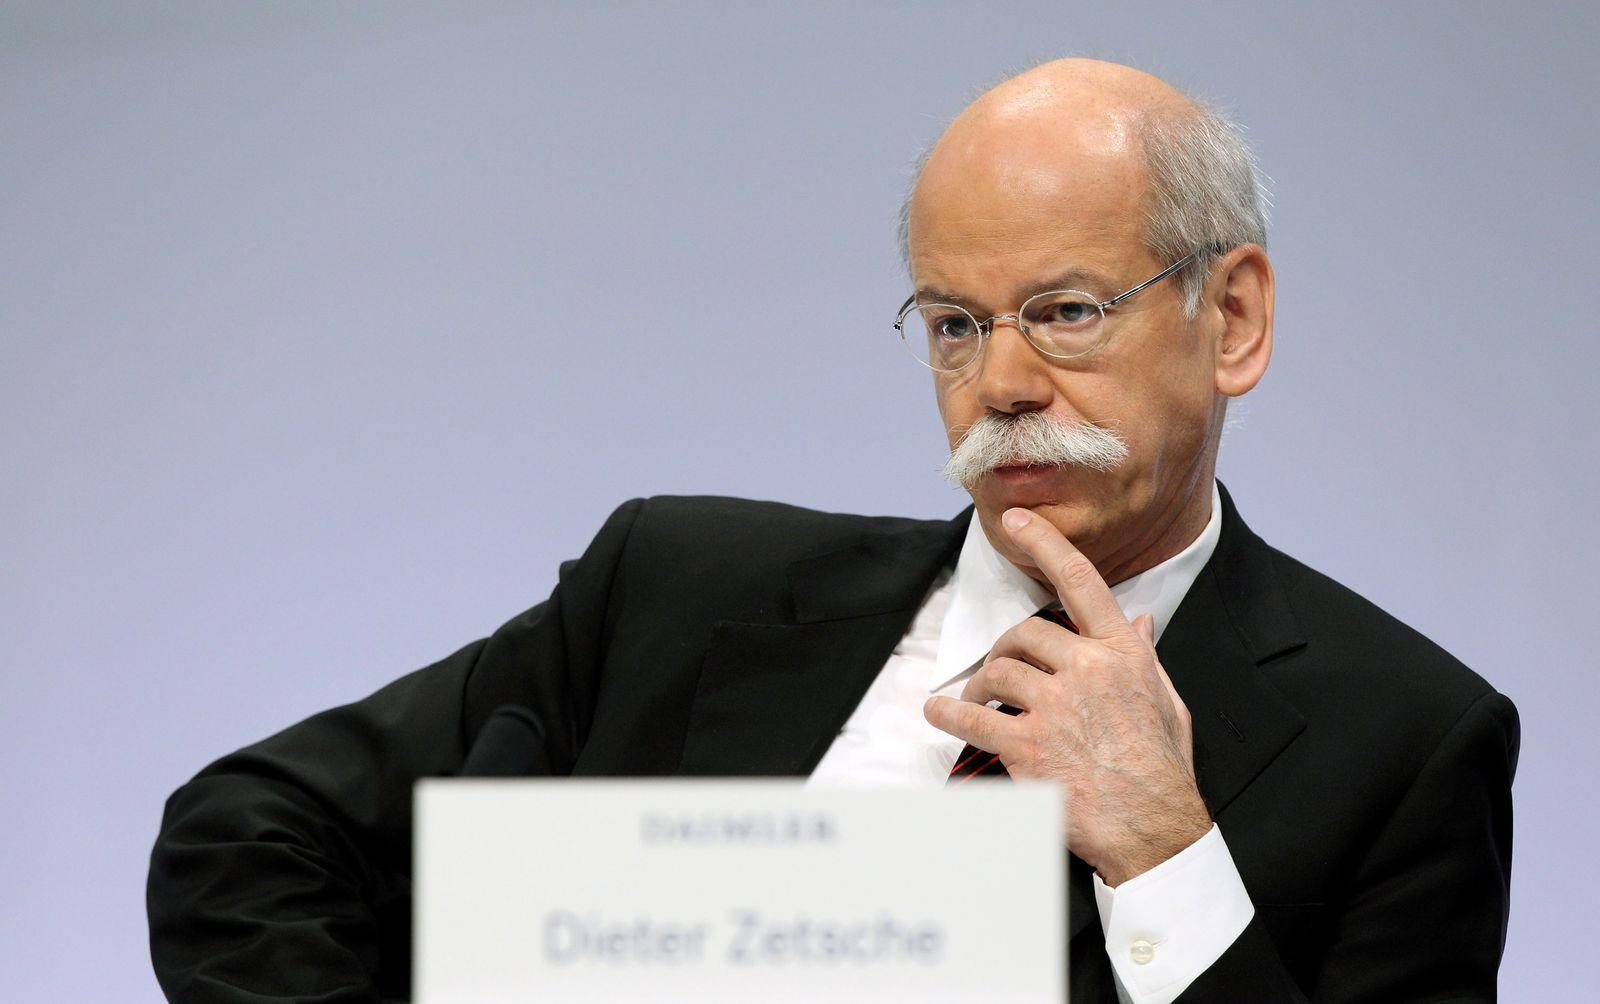 Zetsche/ BPK